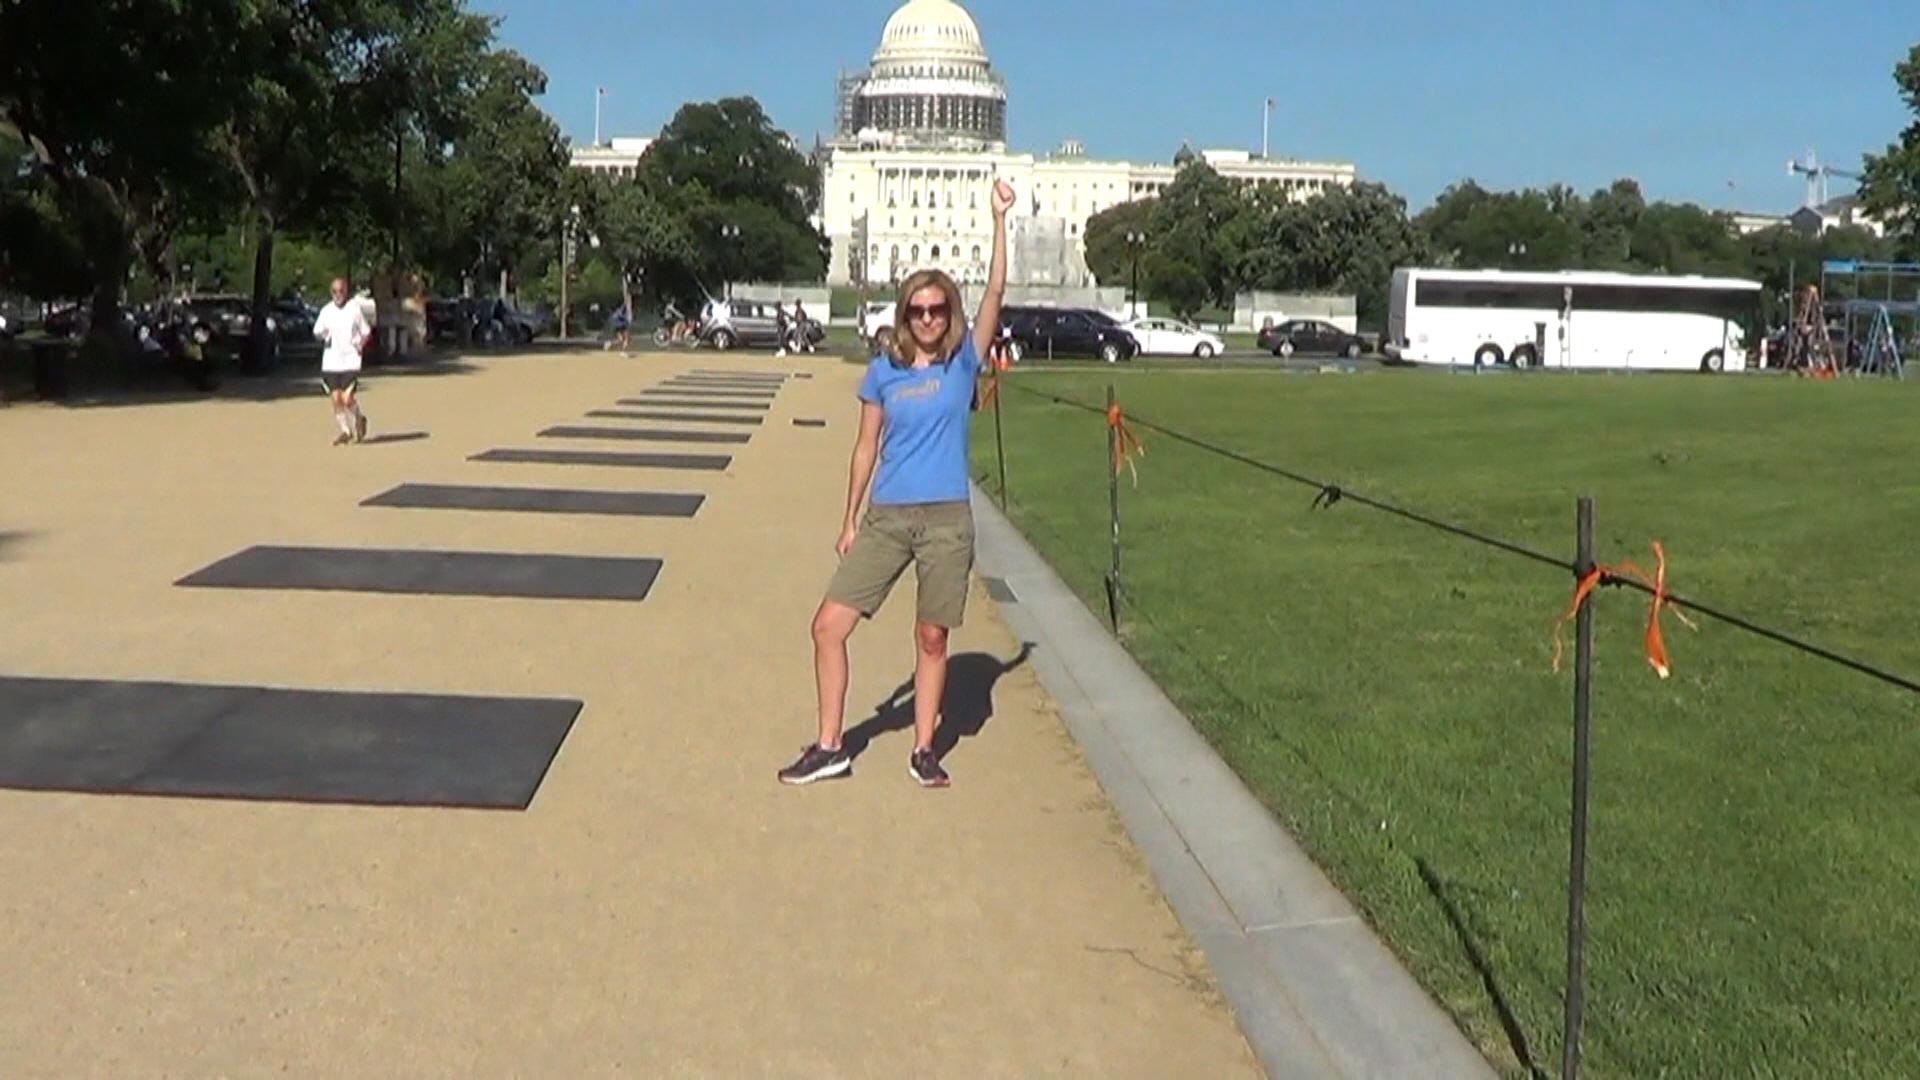 23 - US Capitol